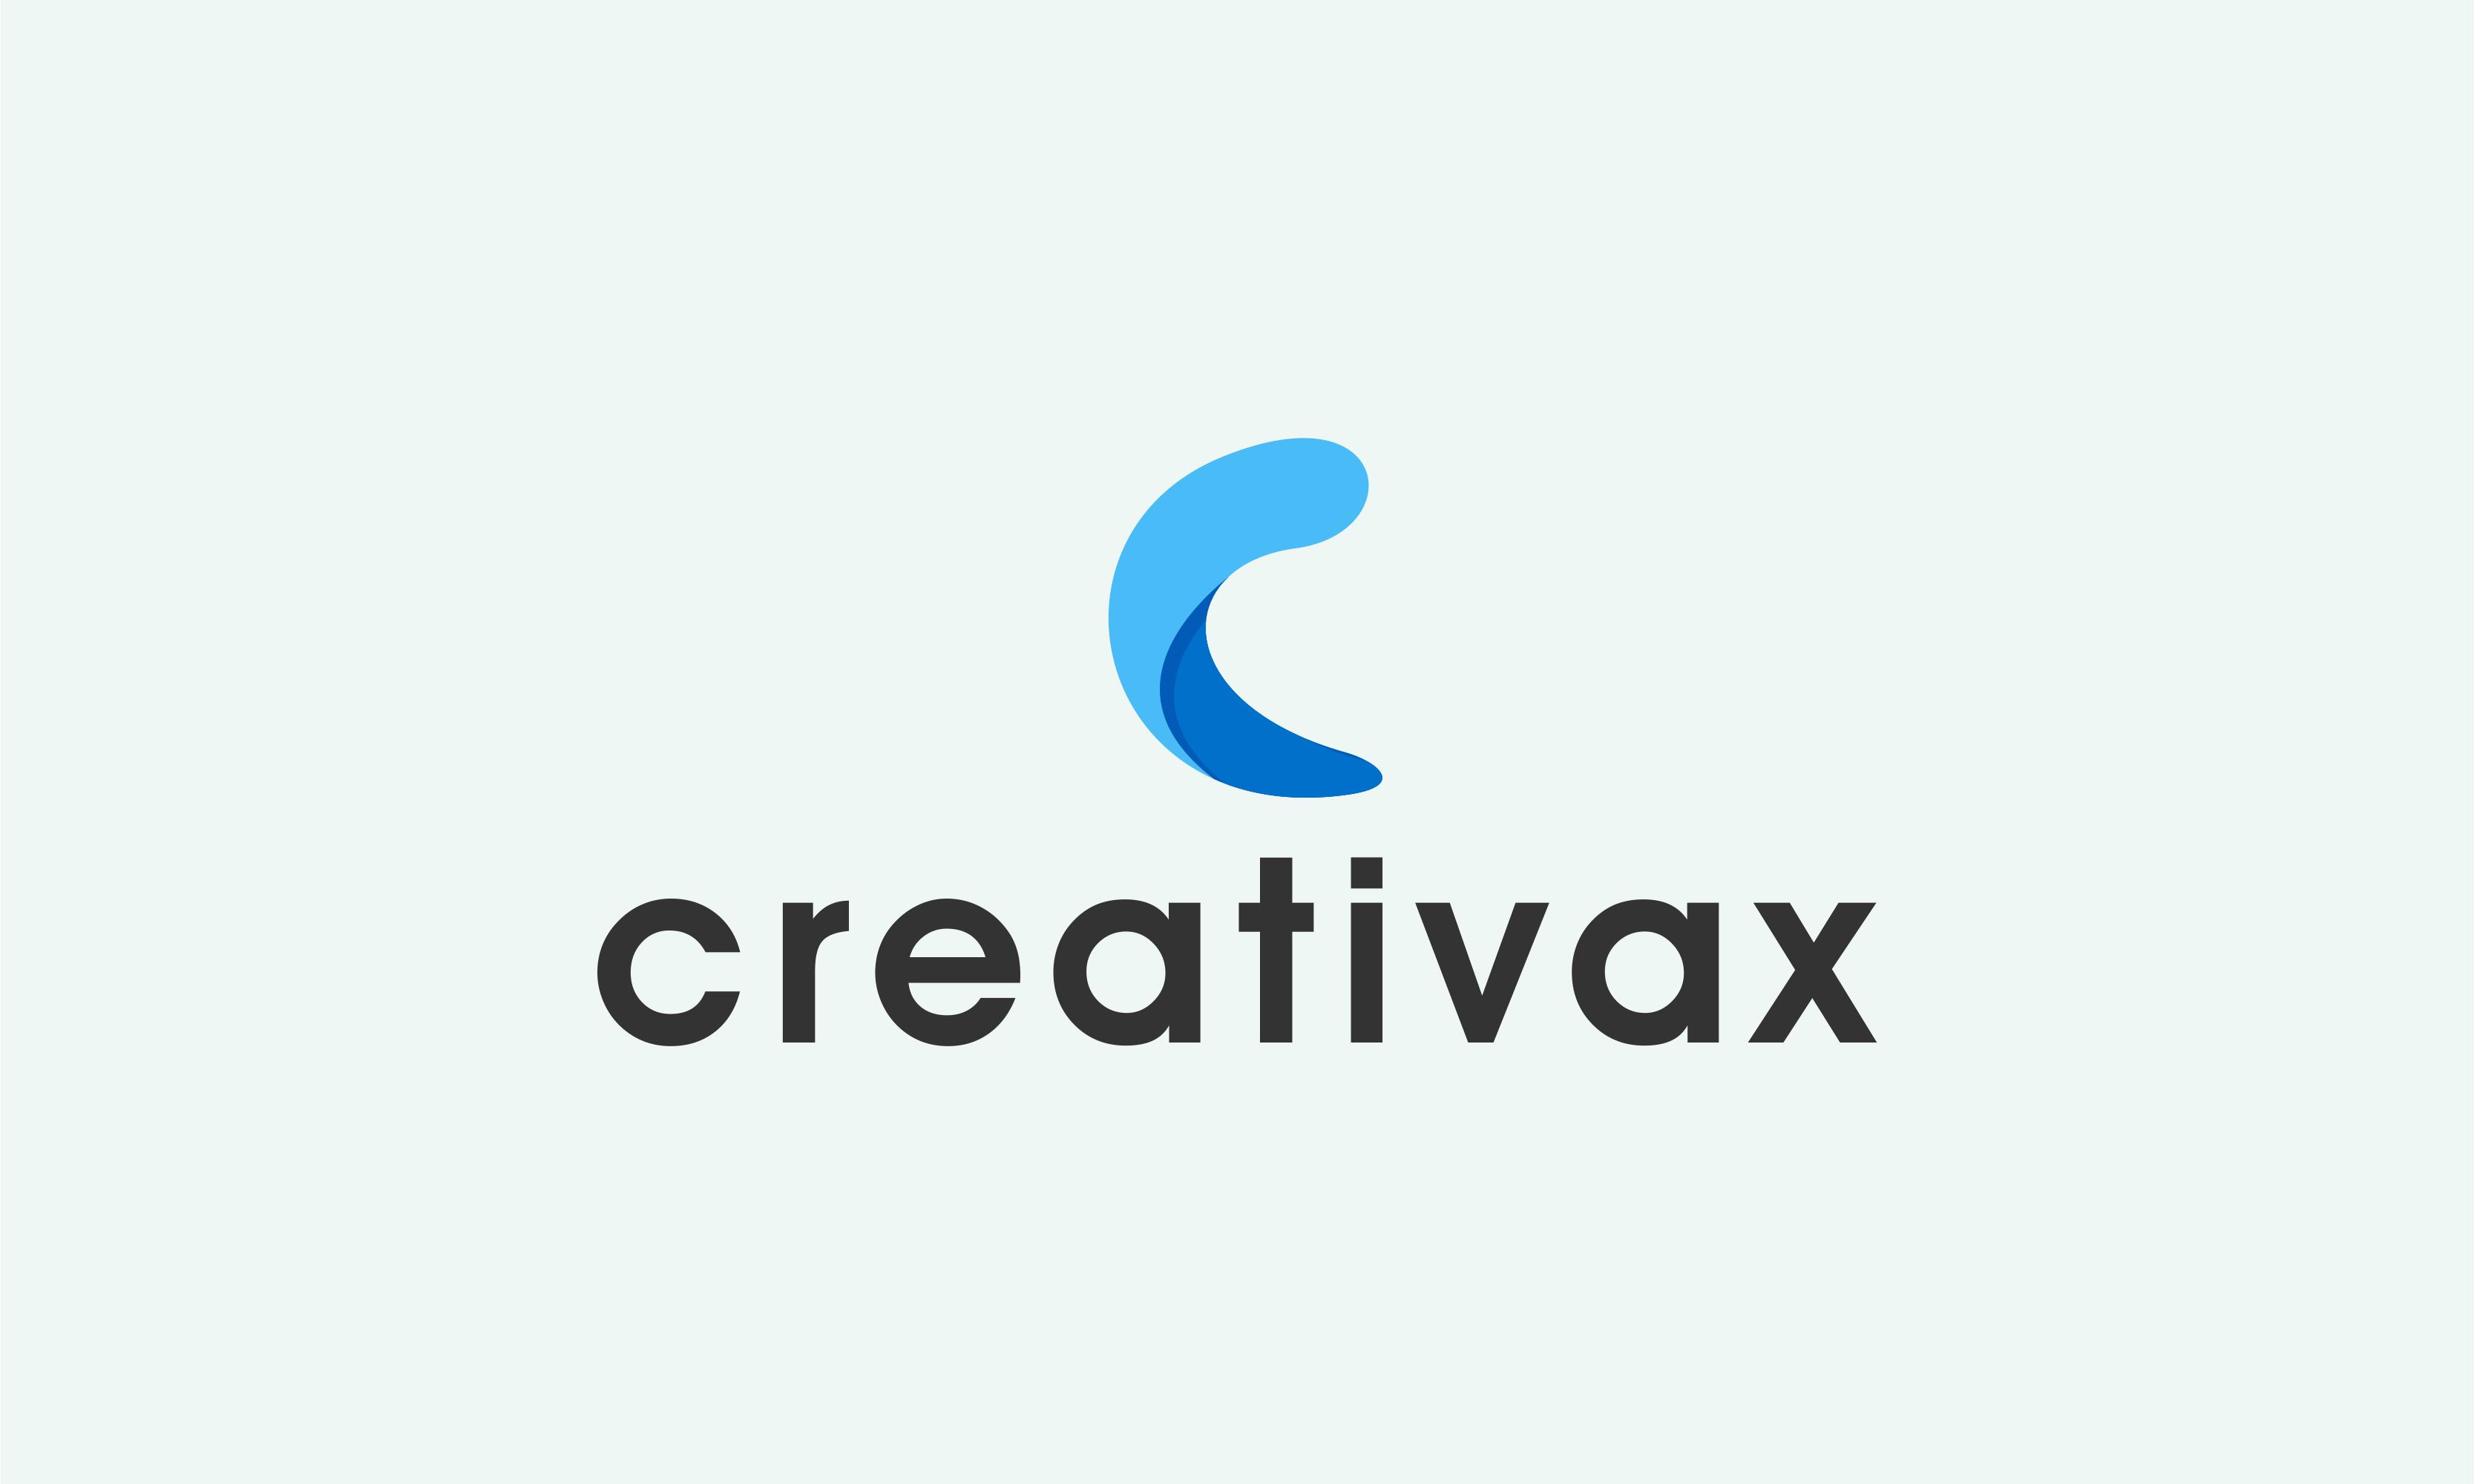 Creativax